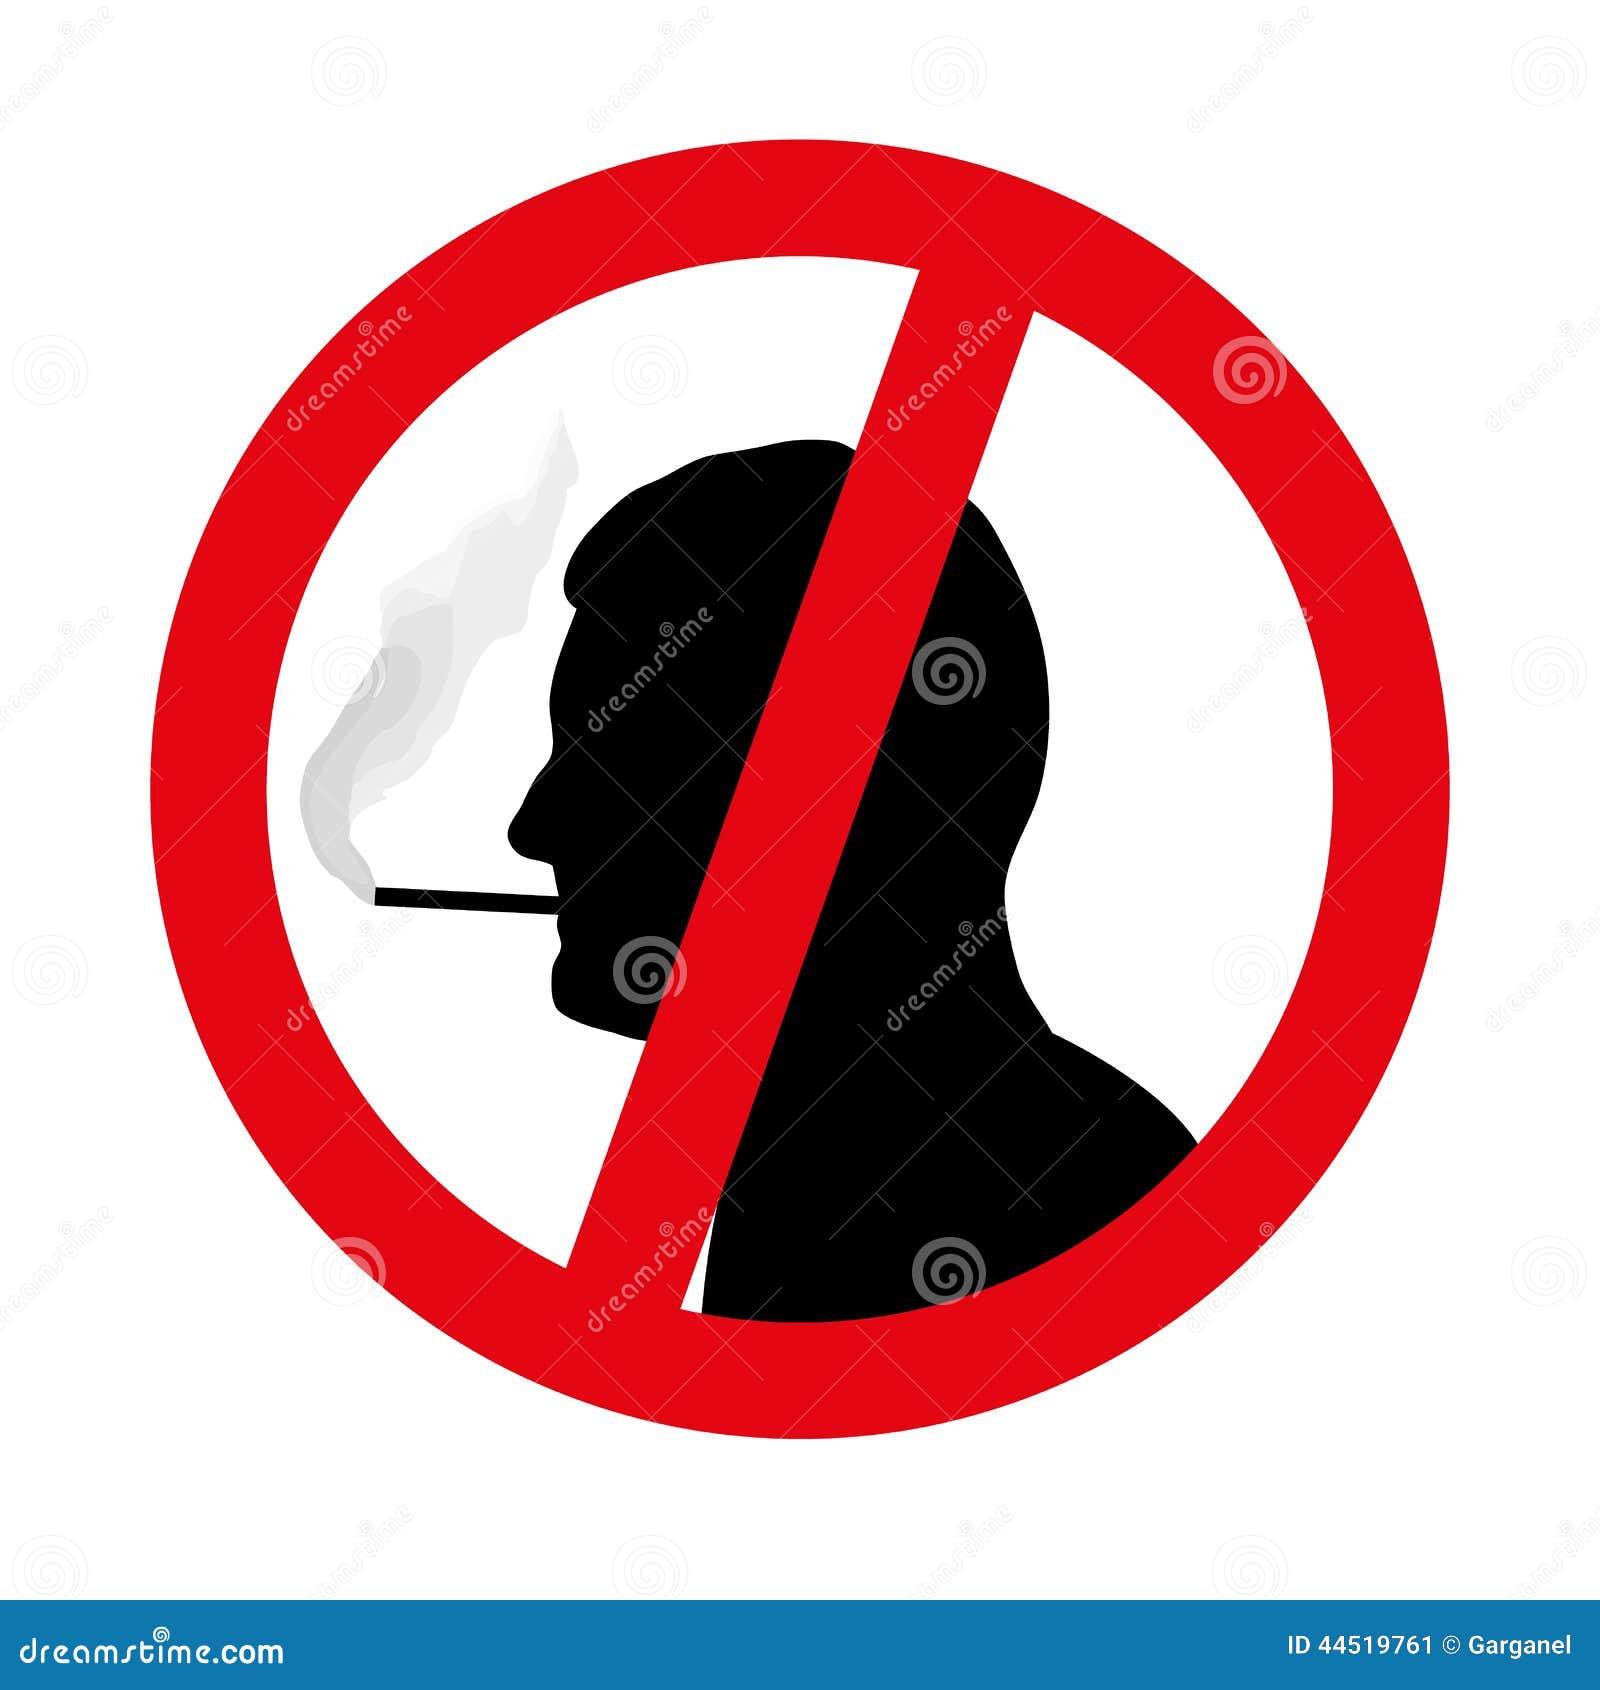 No smoking symbol stock vector illustration of cancer 44519761 no smoking symbol biocorpaavc Image collections